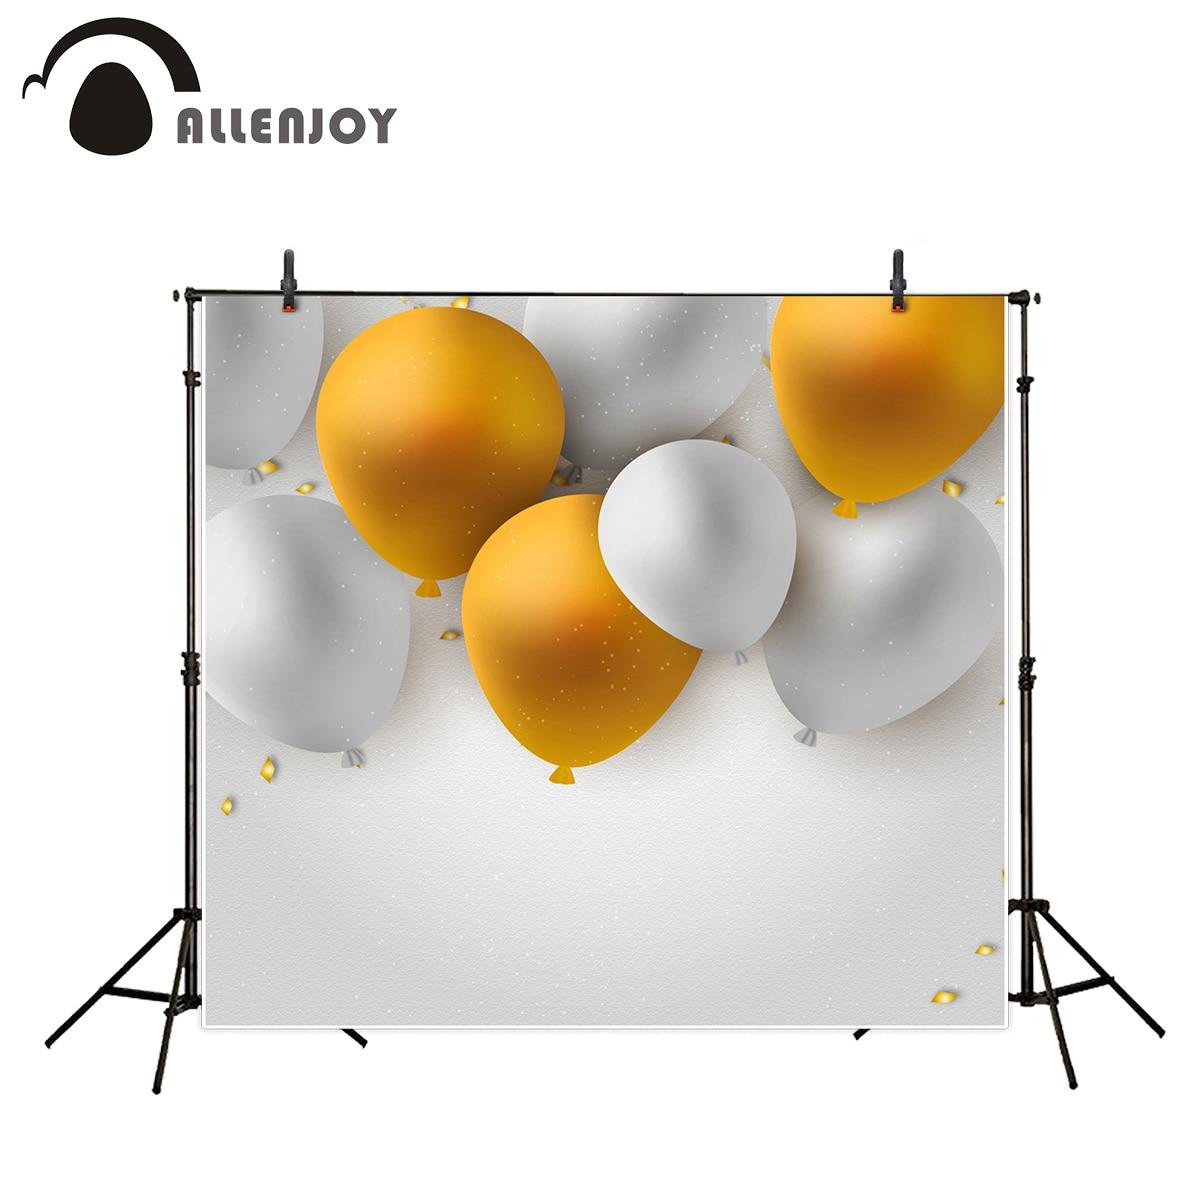 Allenjoy photography background glitter balloon party celebrate fantasy props for newborn photobooth backdrop 5feet 6 5feet background snow housing balloon photography backdropsvinyl photography backdrop 3447 lk